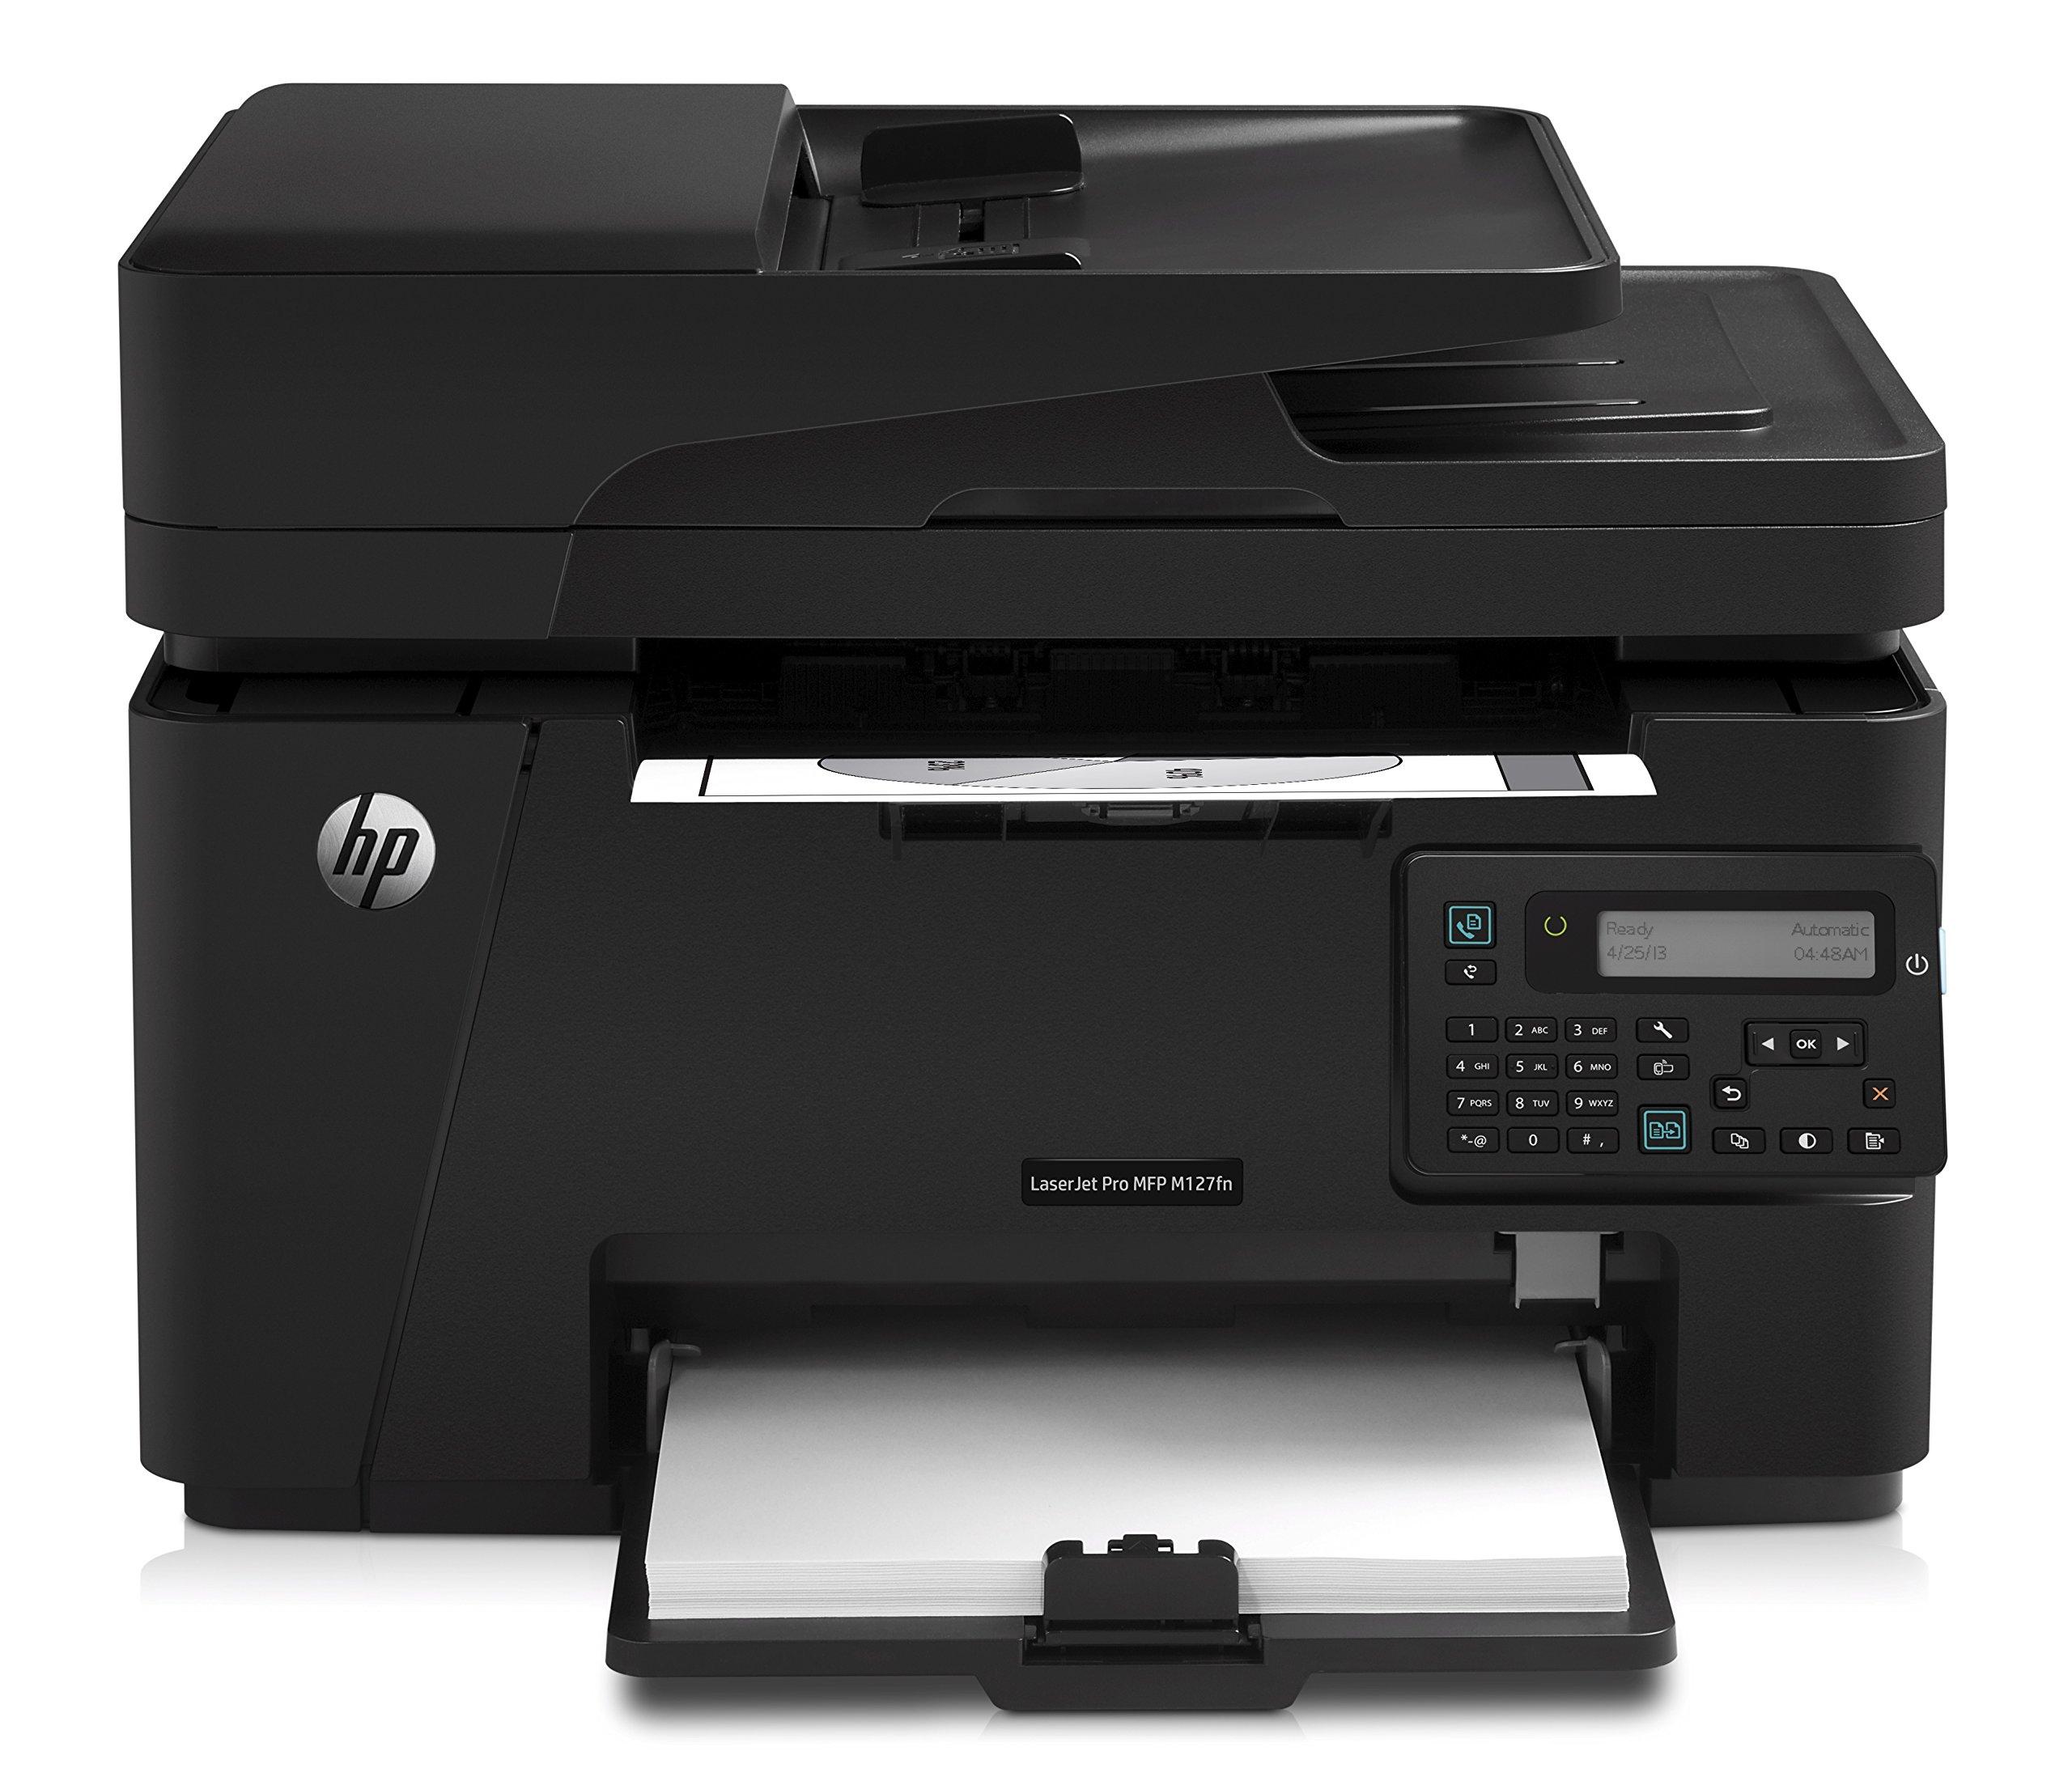 HP Laserjet Pro M127fn Networked All-in-One Monochrome Printer, (CZ181A)